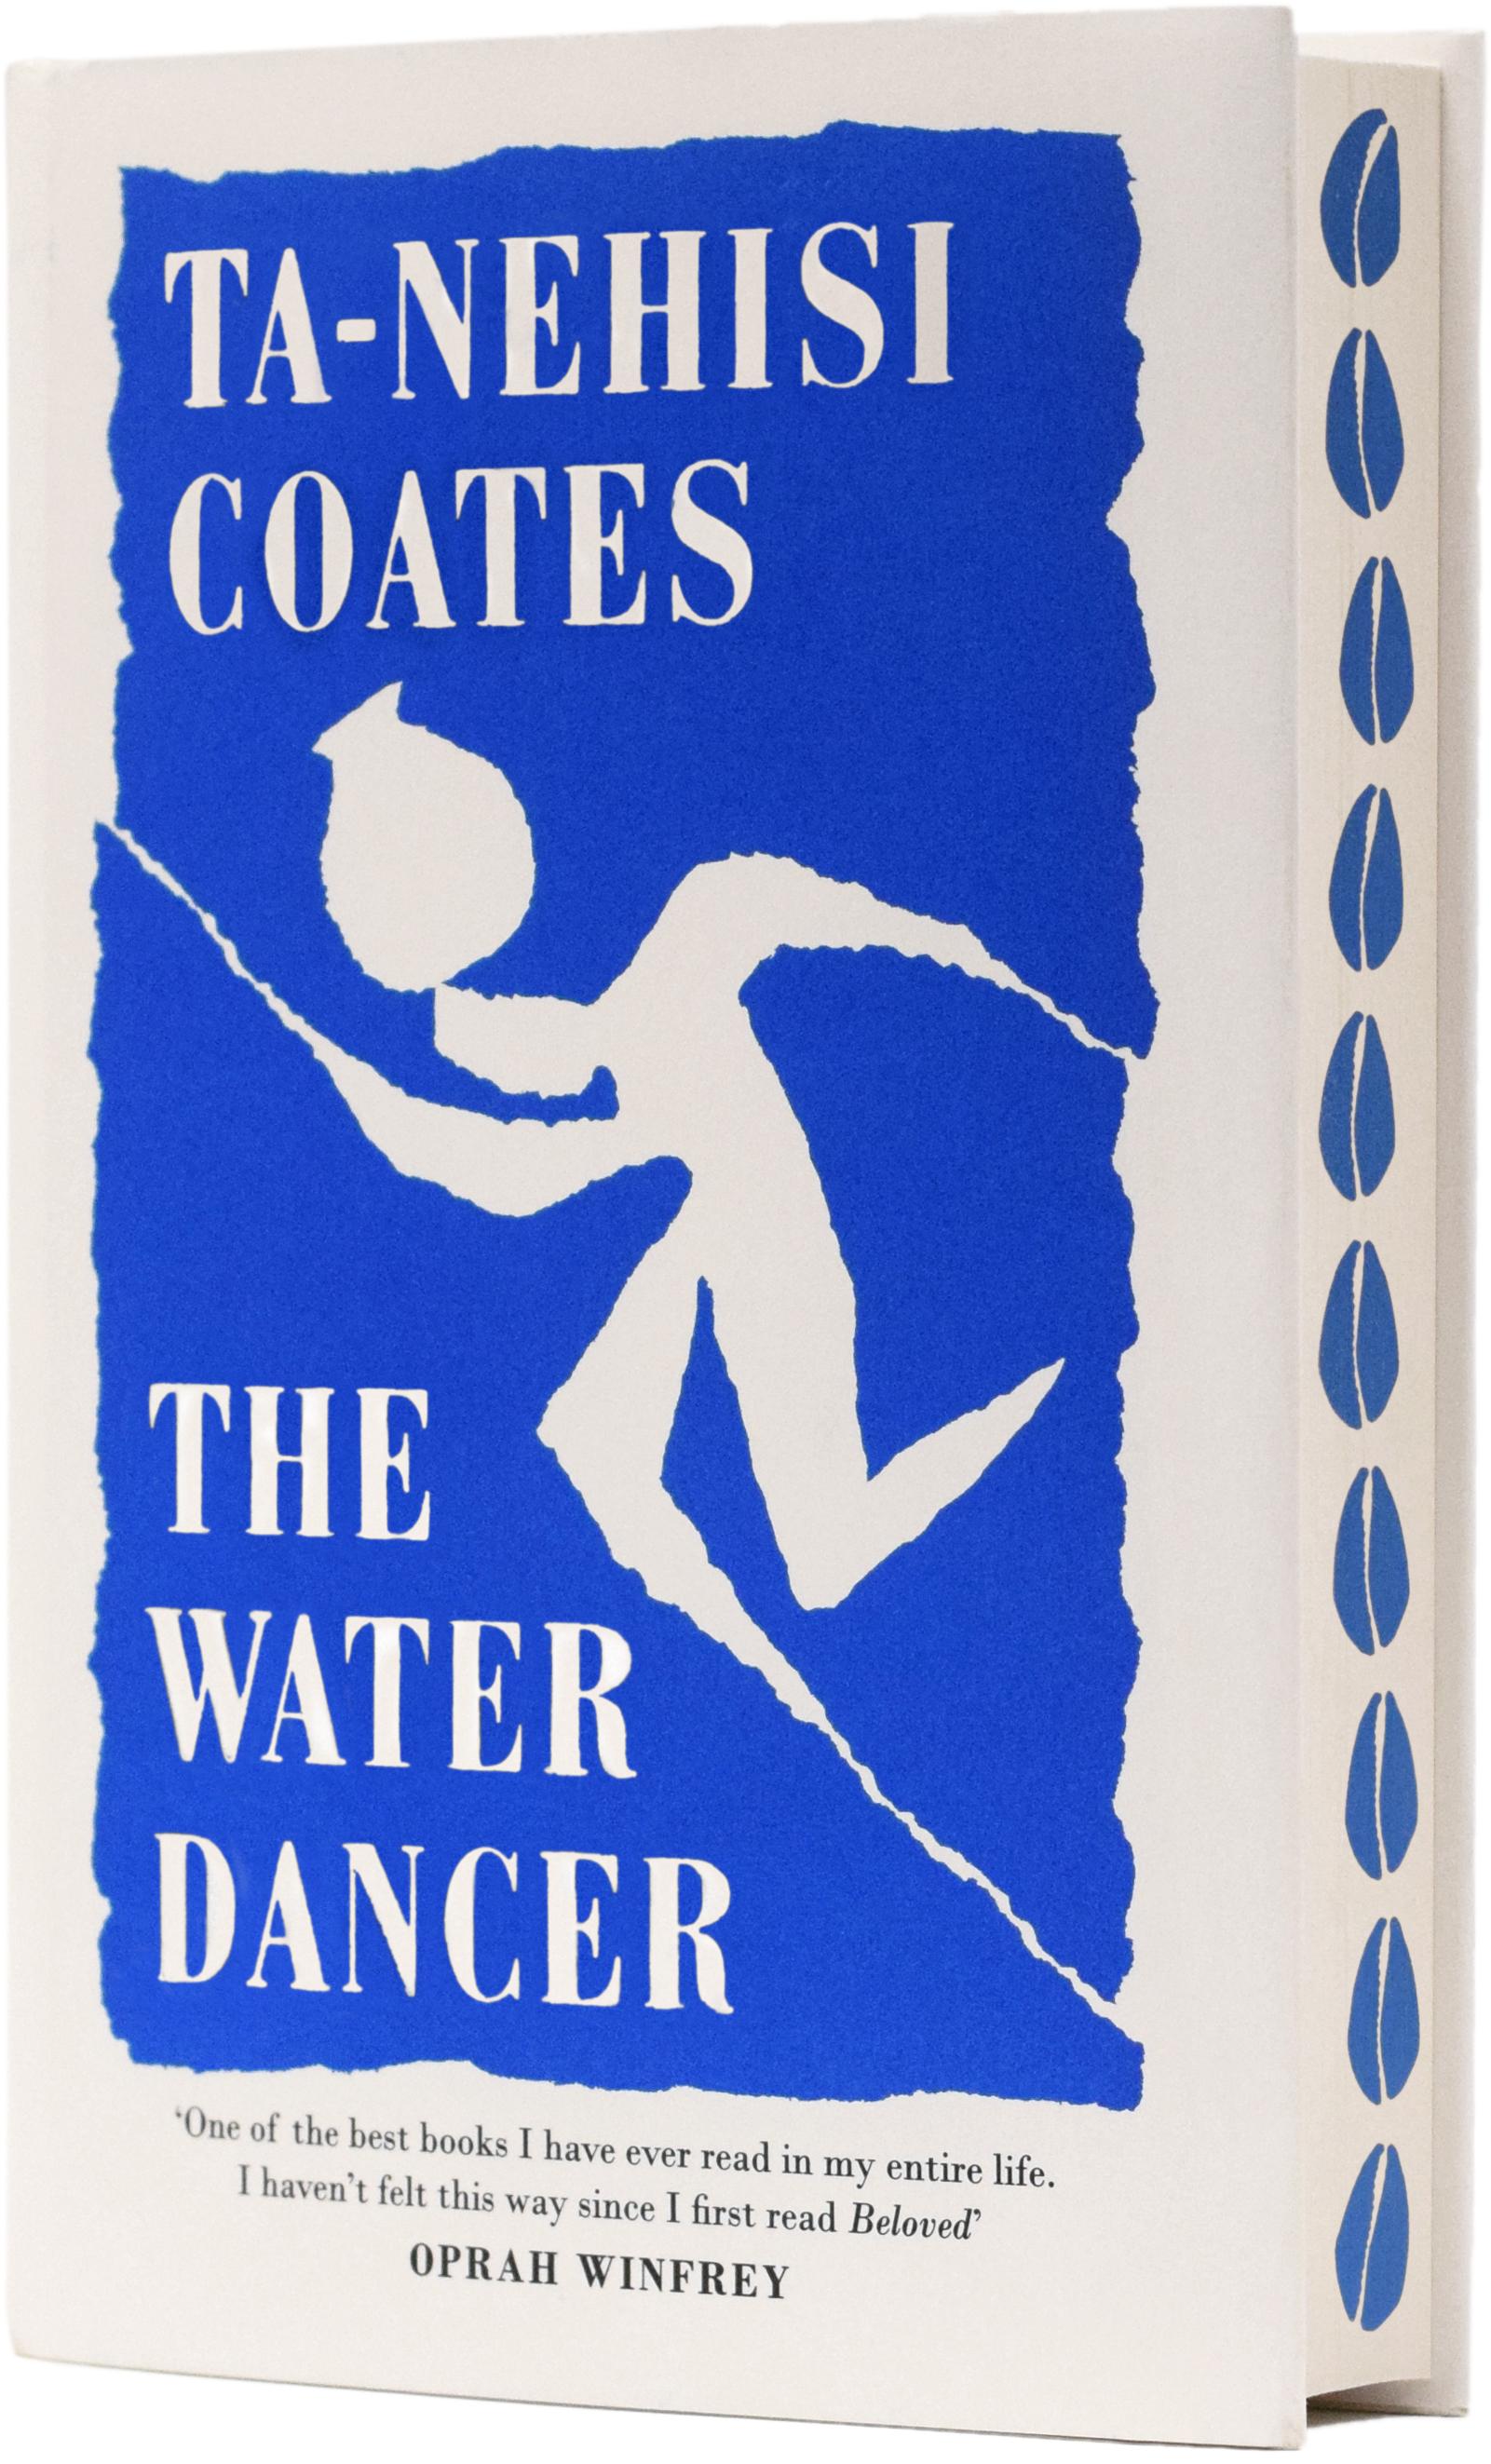 ta nehisi coates the water dancer foyles sprayed edges